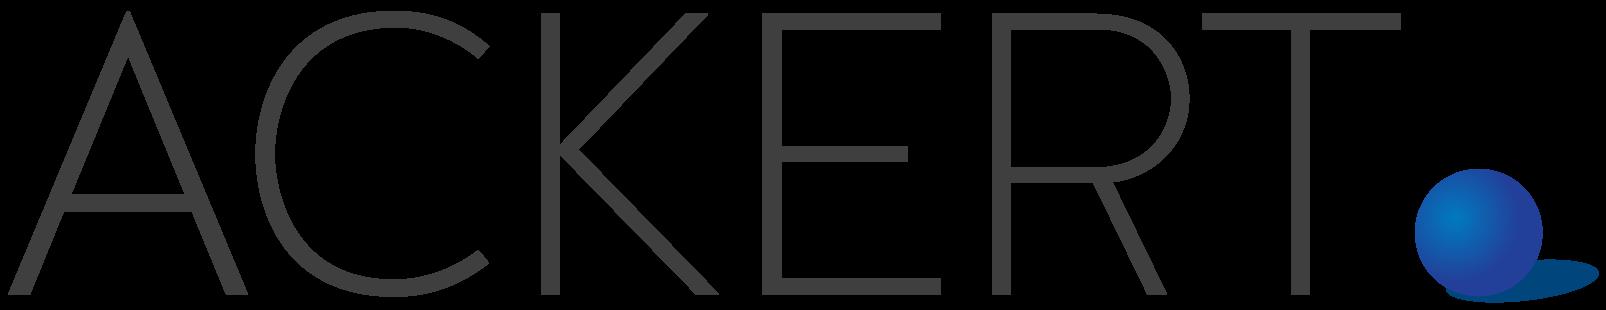 Ackert logo header